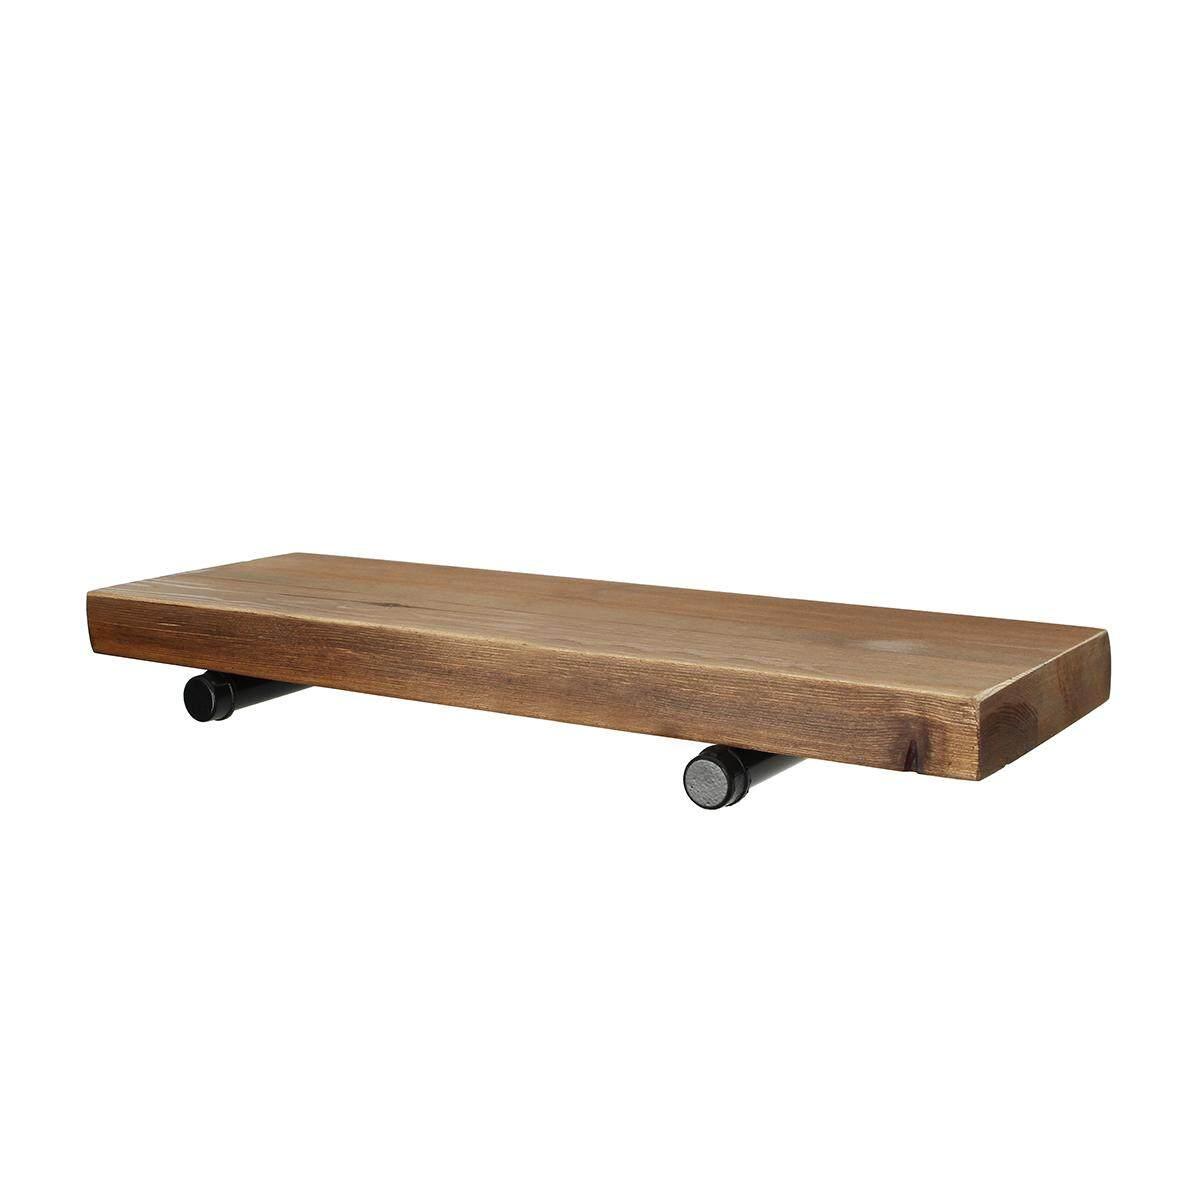 8 Deep Industrial Floating Shelf, Rustic Shelf, Pipe Shelf, Industrial